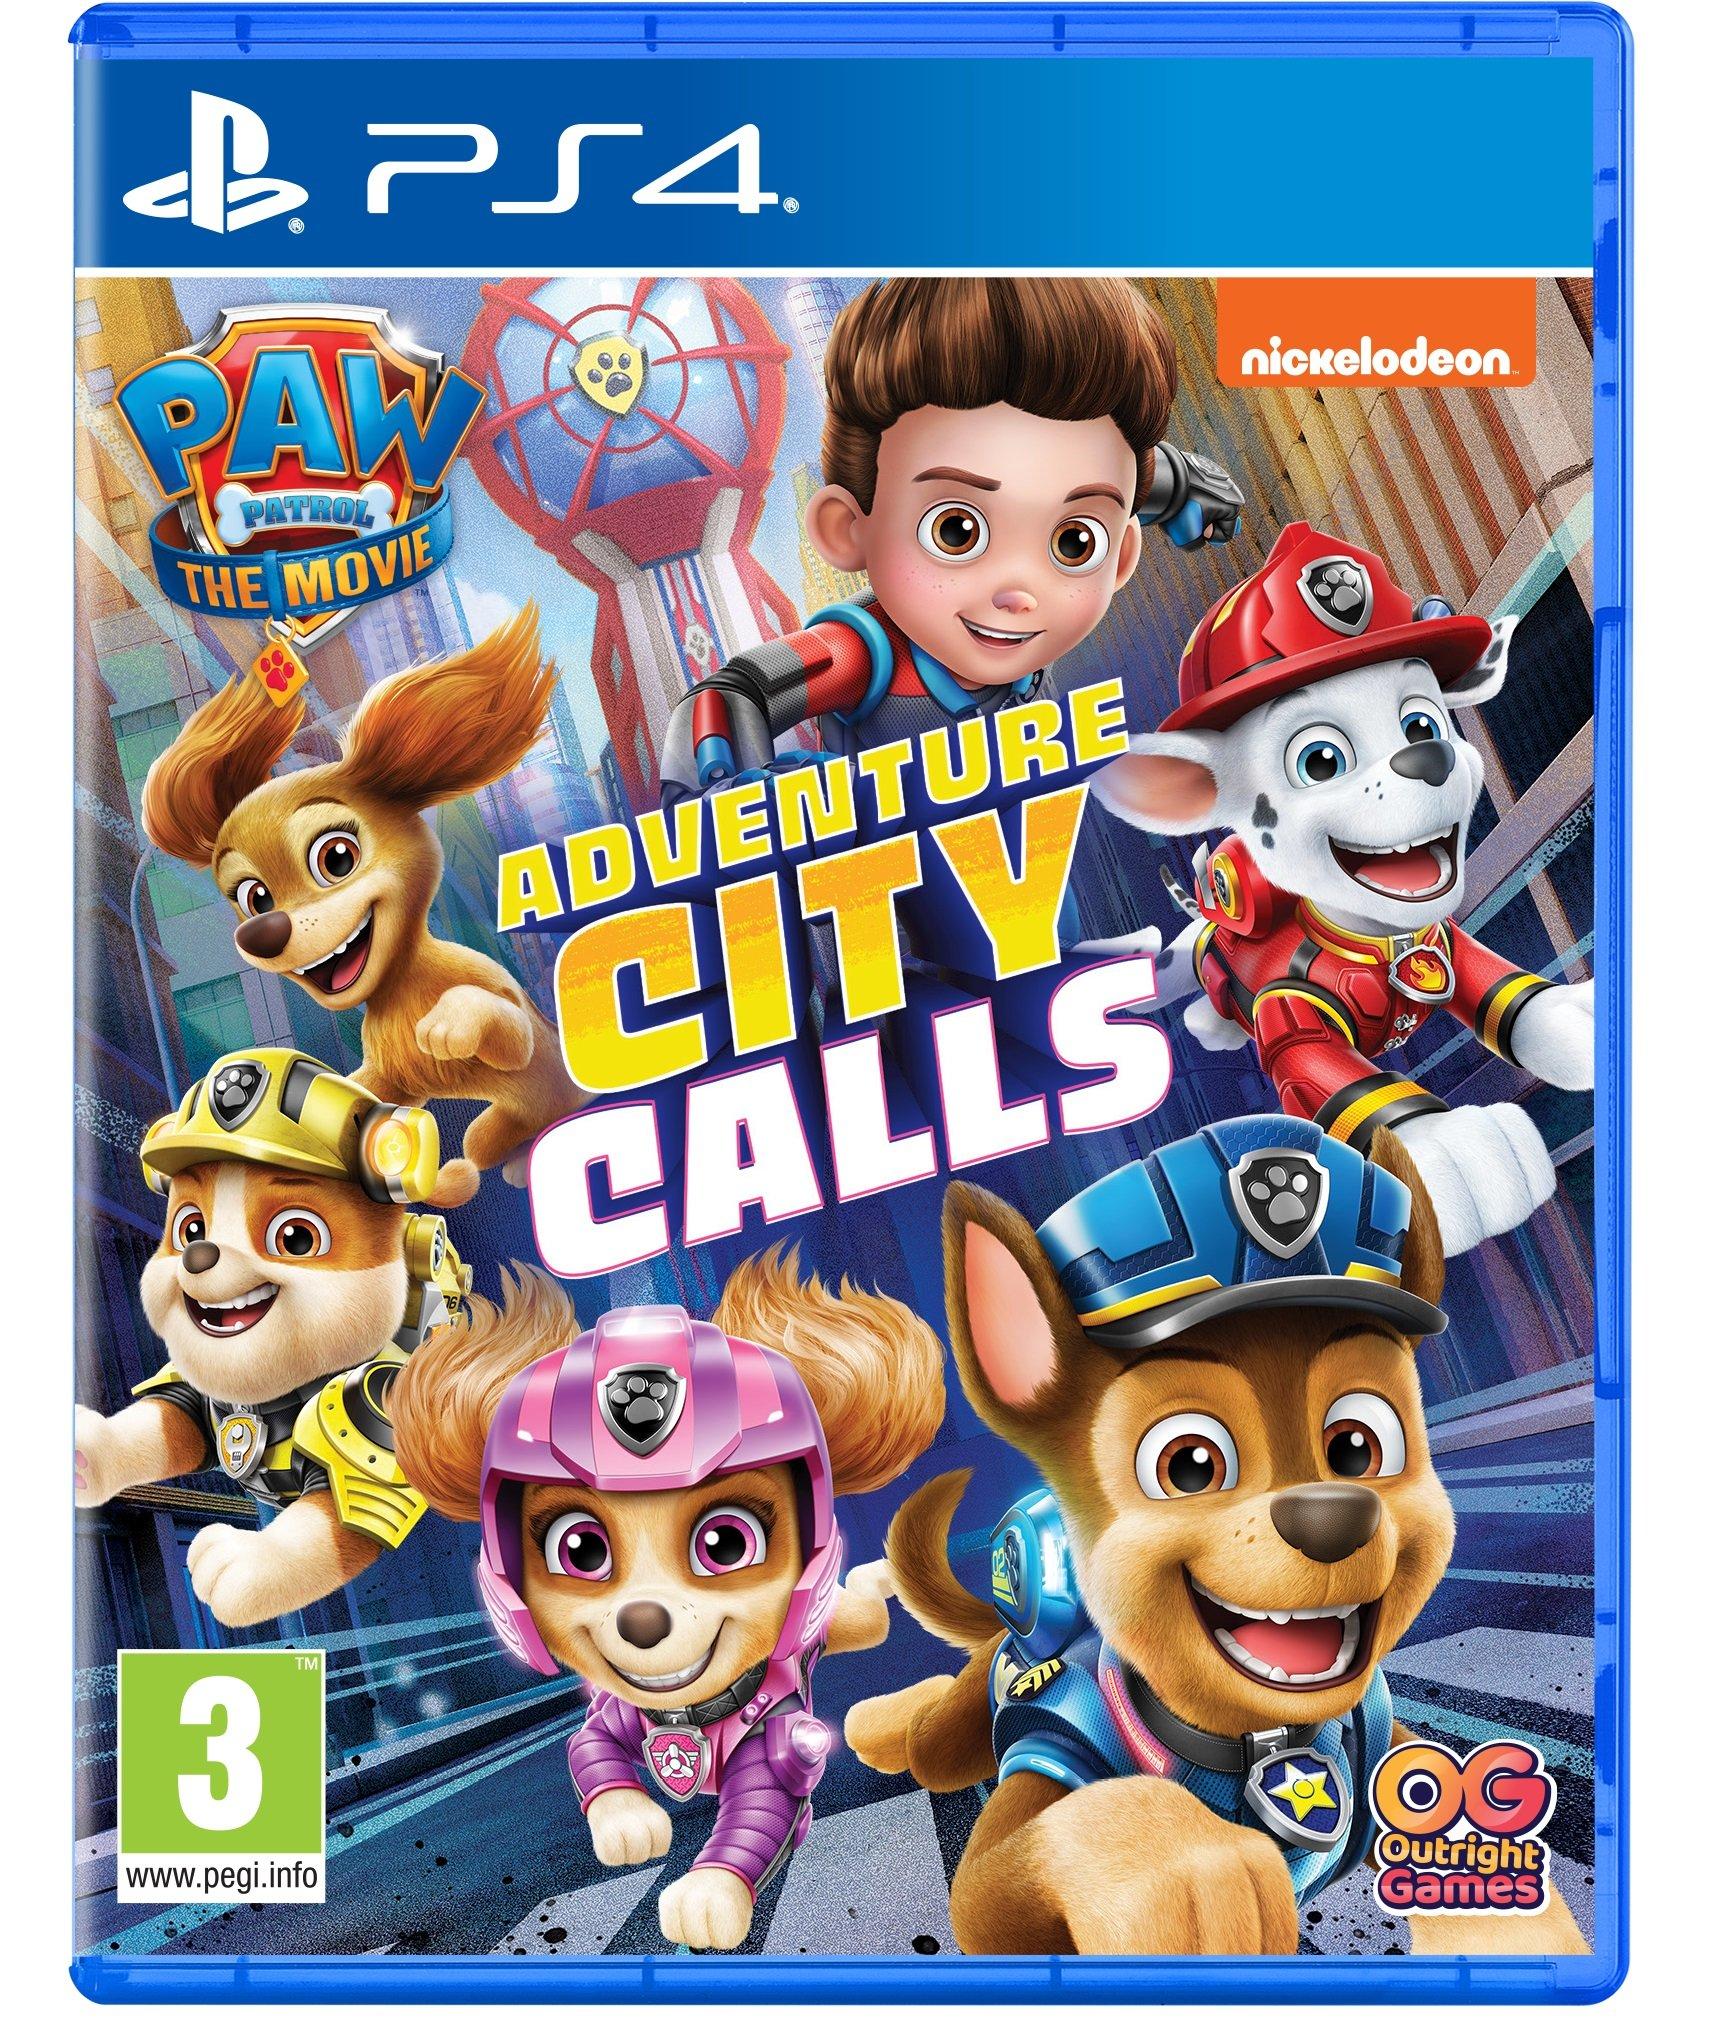 Kaufe Paw Patrol The Movie Adventure City Calls Playstation 4 Englisch Standard Inkl Versand